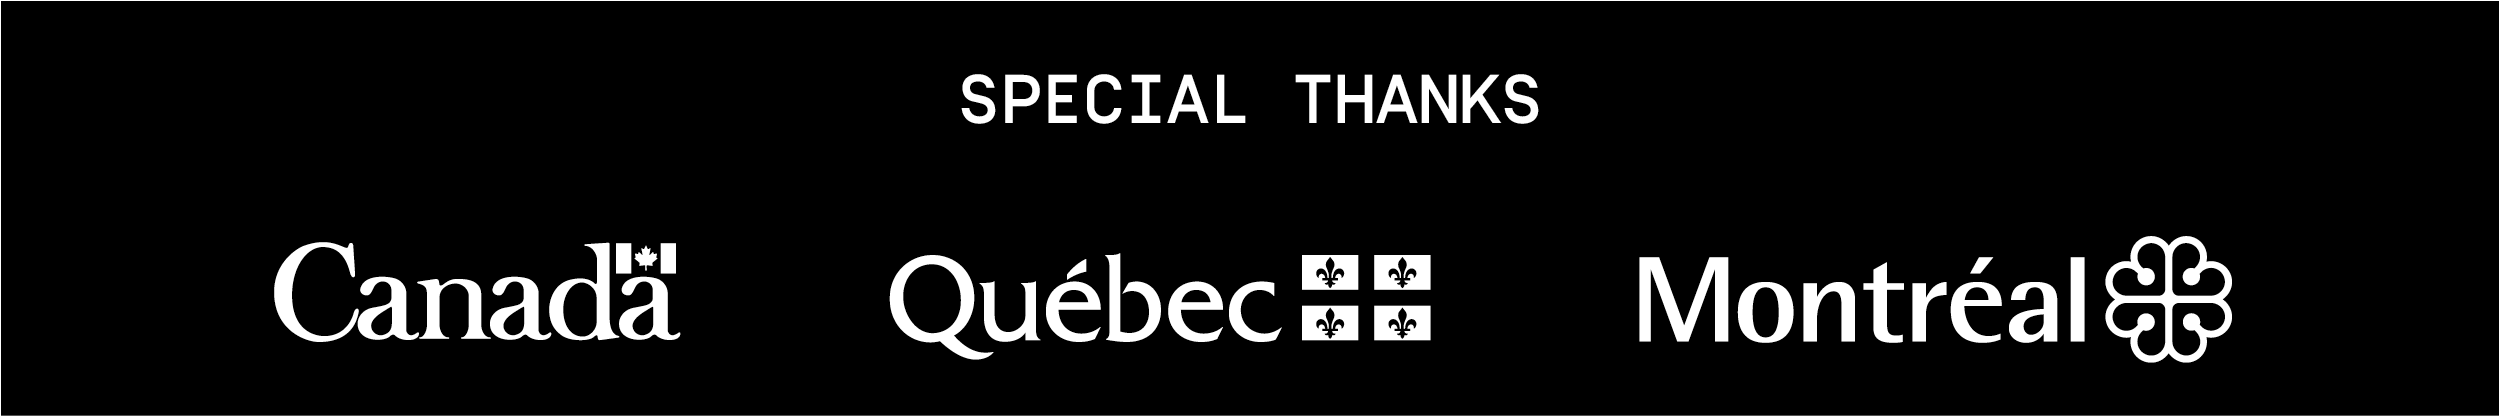 special thanks: government of Canada, government of Québec, City of Montréal